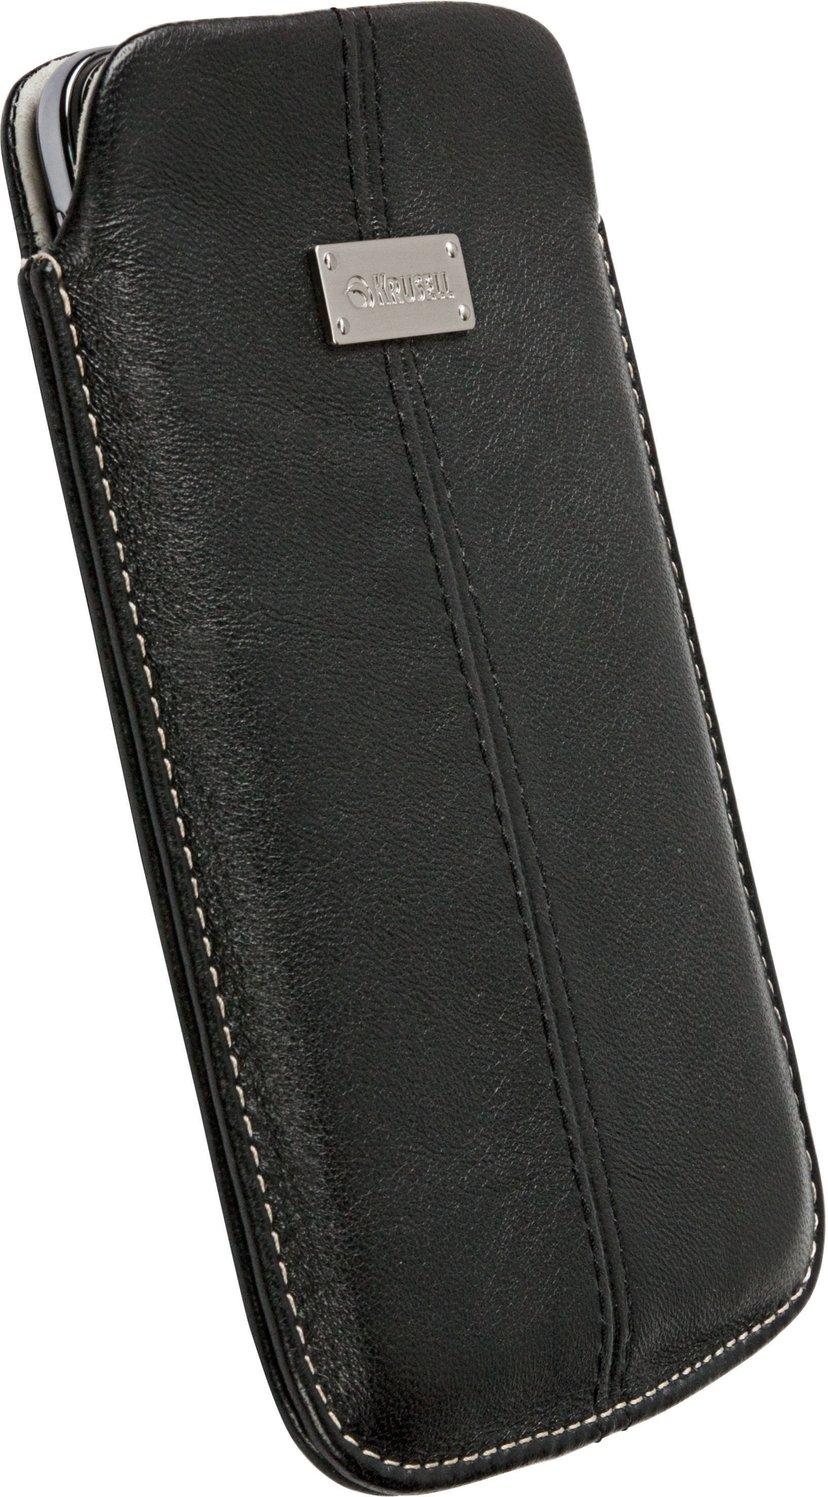 Krusell Luna Mobile Pouch 4Xl - Black